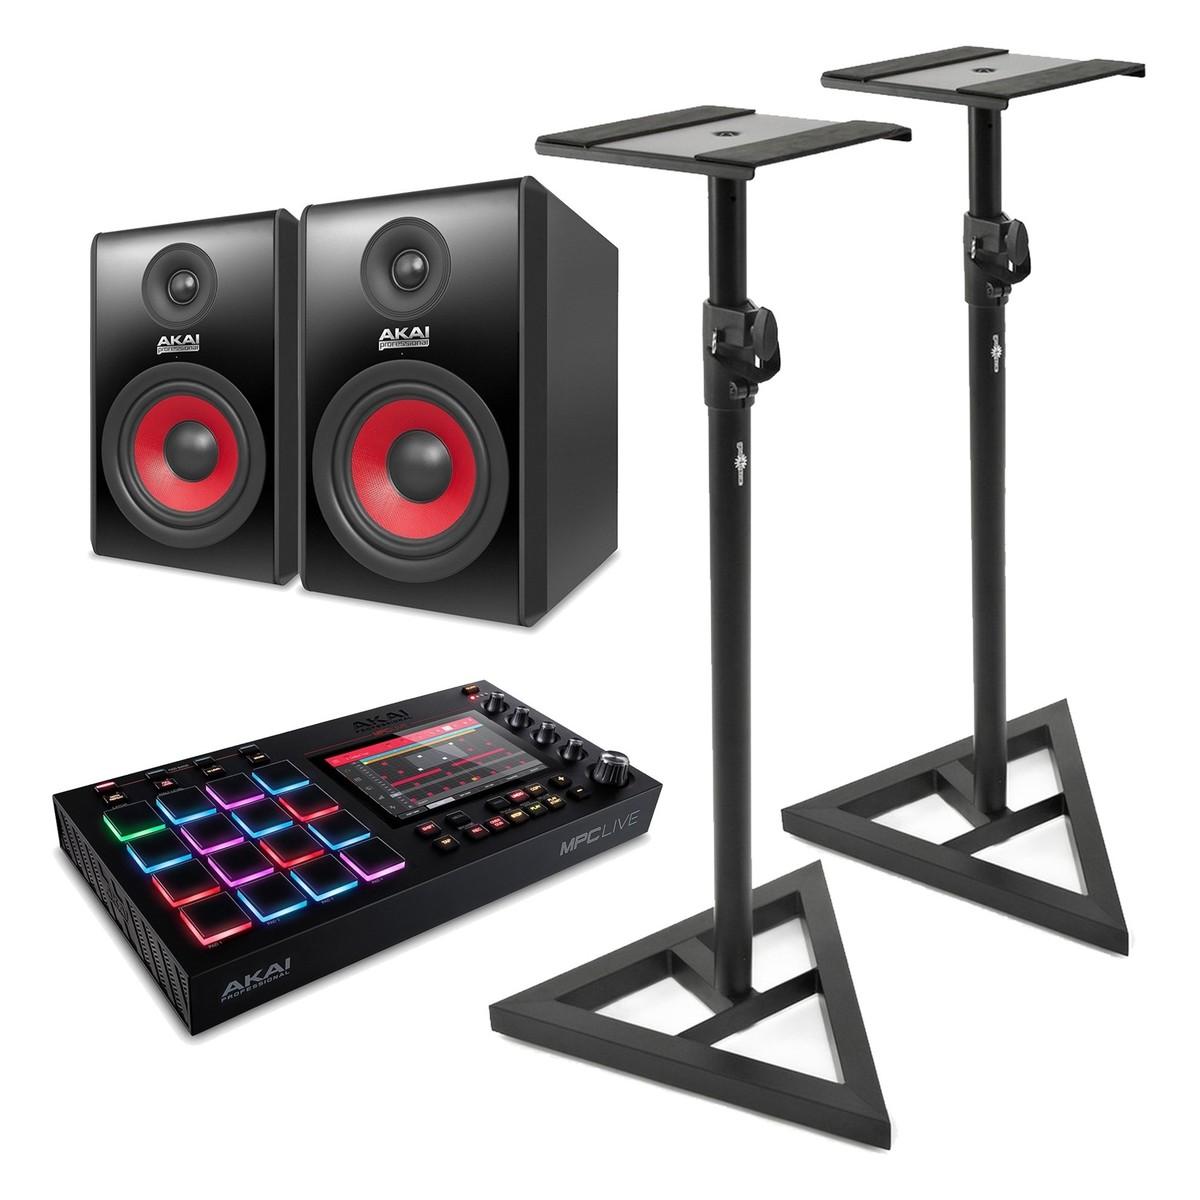 Akai MPC Live With Akai RPM 500 Studio Monitors And Stands